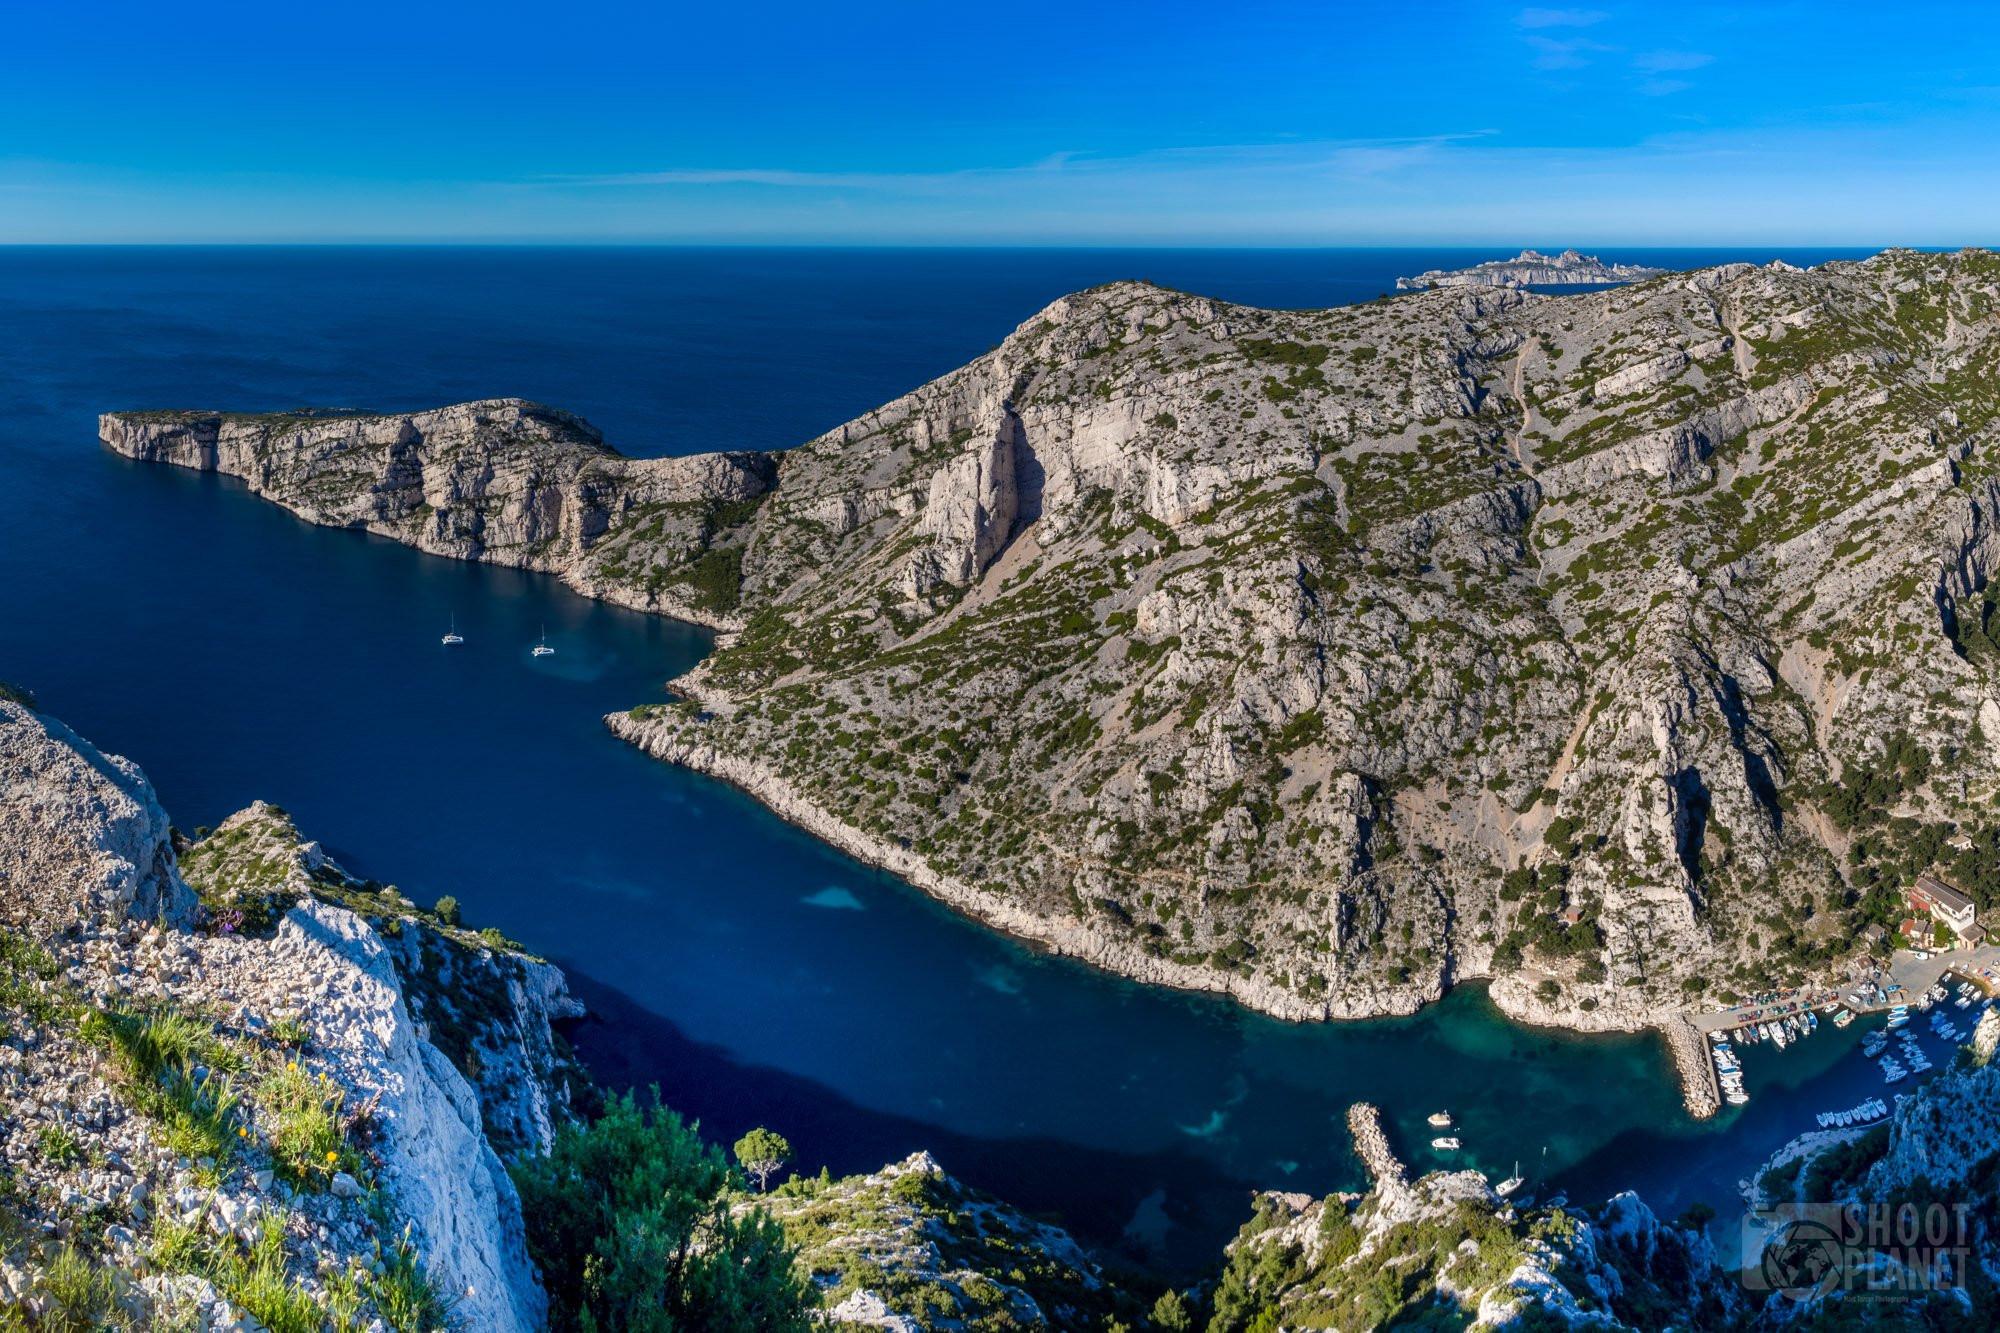 sugiton viewpoint panorama, Azure coast France